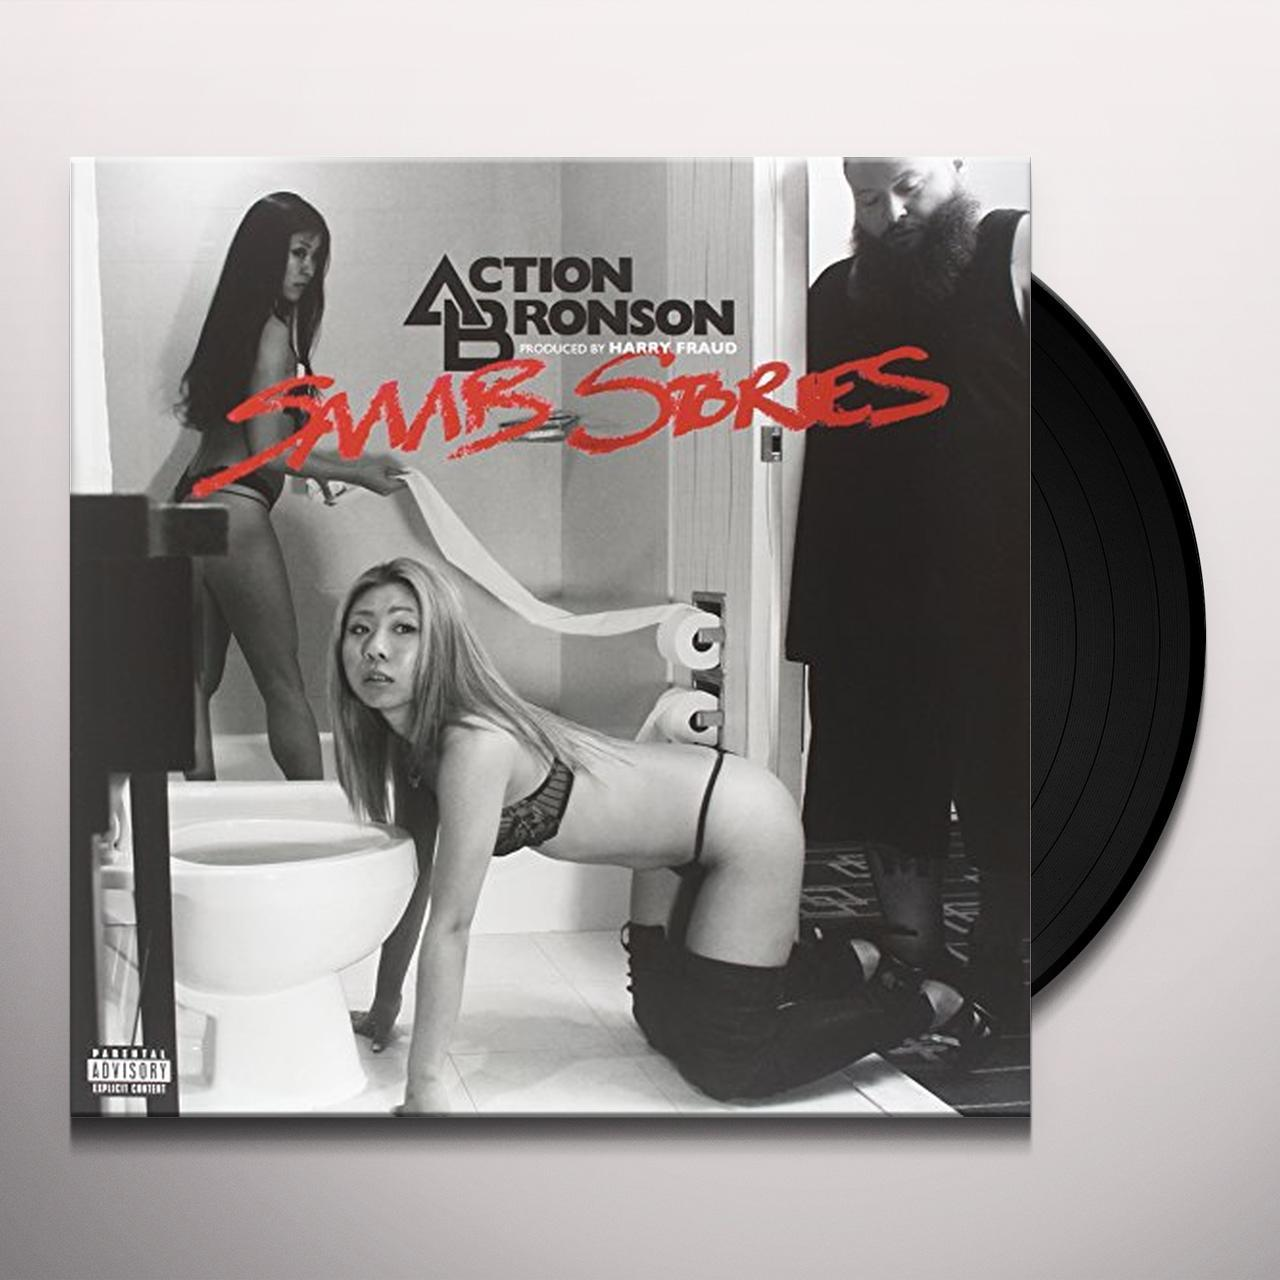 Action Bronson Saaab Stories Vinyl Record-3749